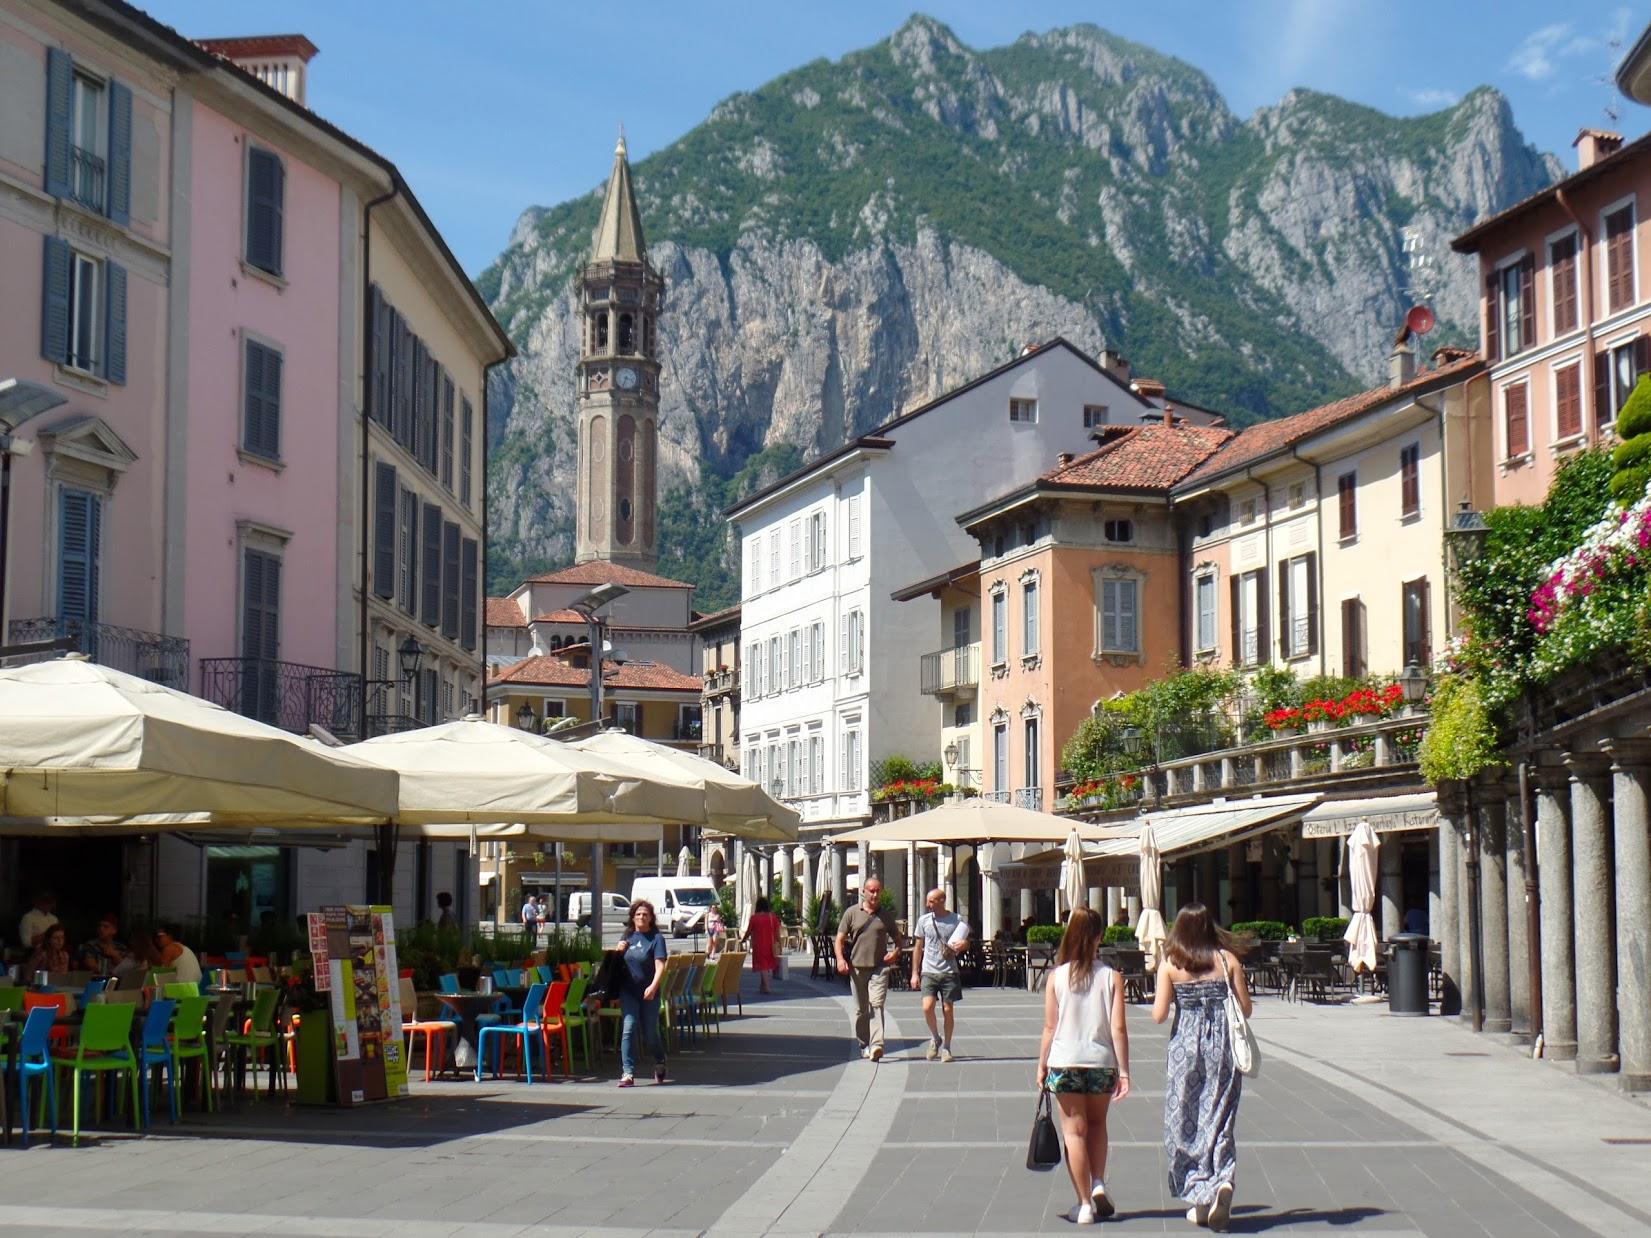 Lago di Como & Monza: Lakes & Pains – The Baedeker Raids